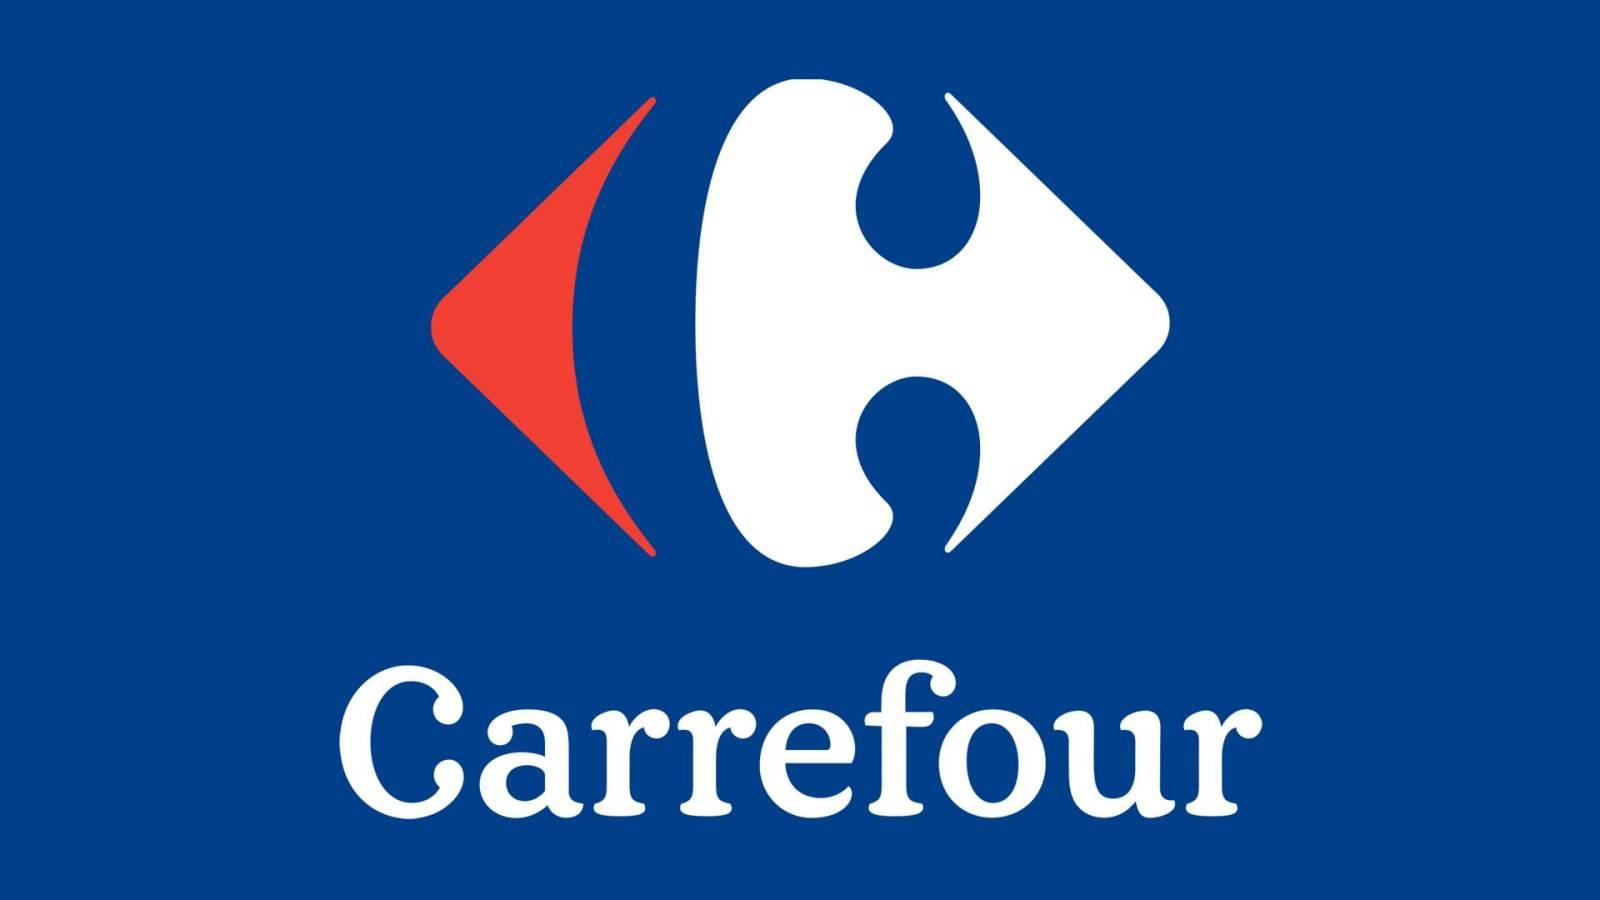 Carrefour schimb